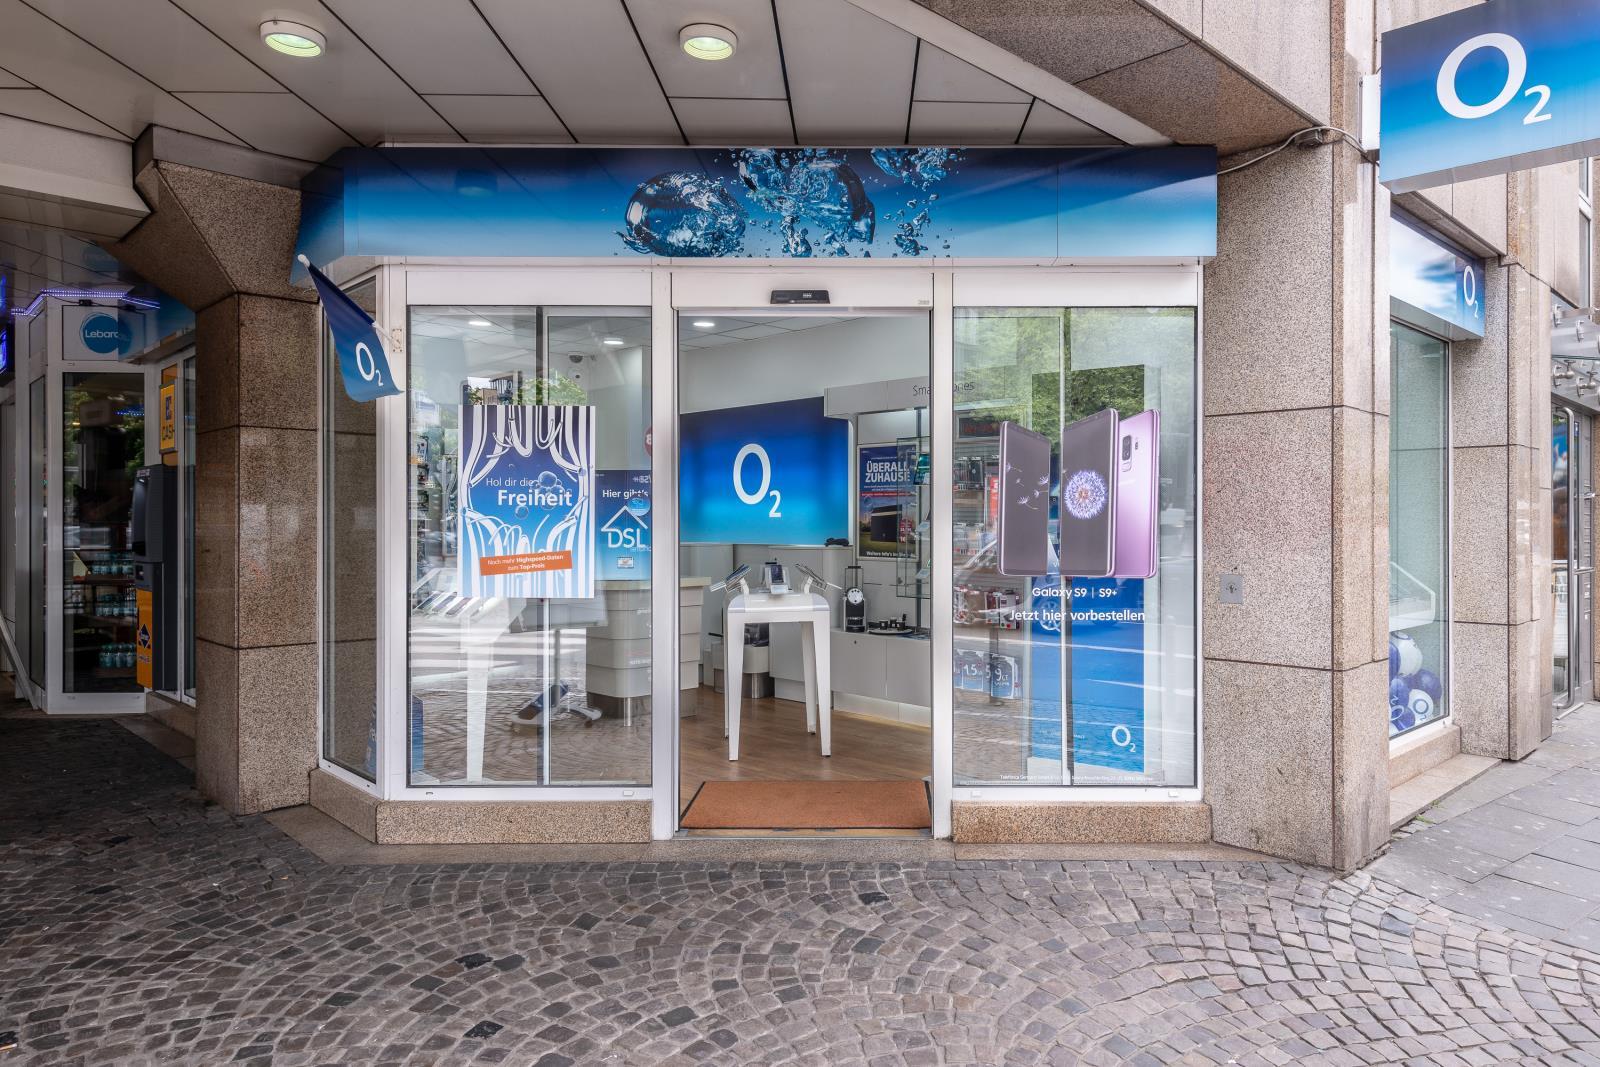 o2 Shop, Friesenplatz 1 in Köln